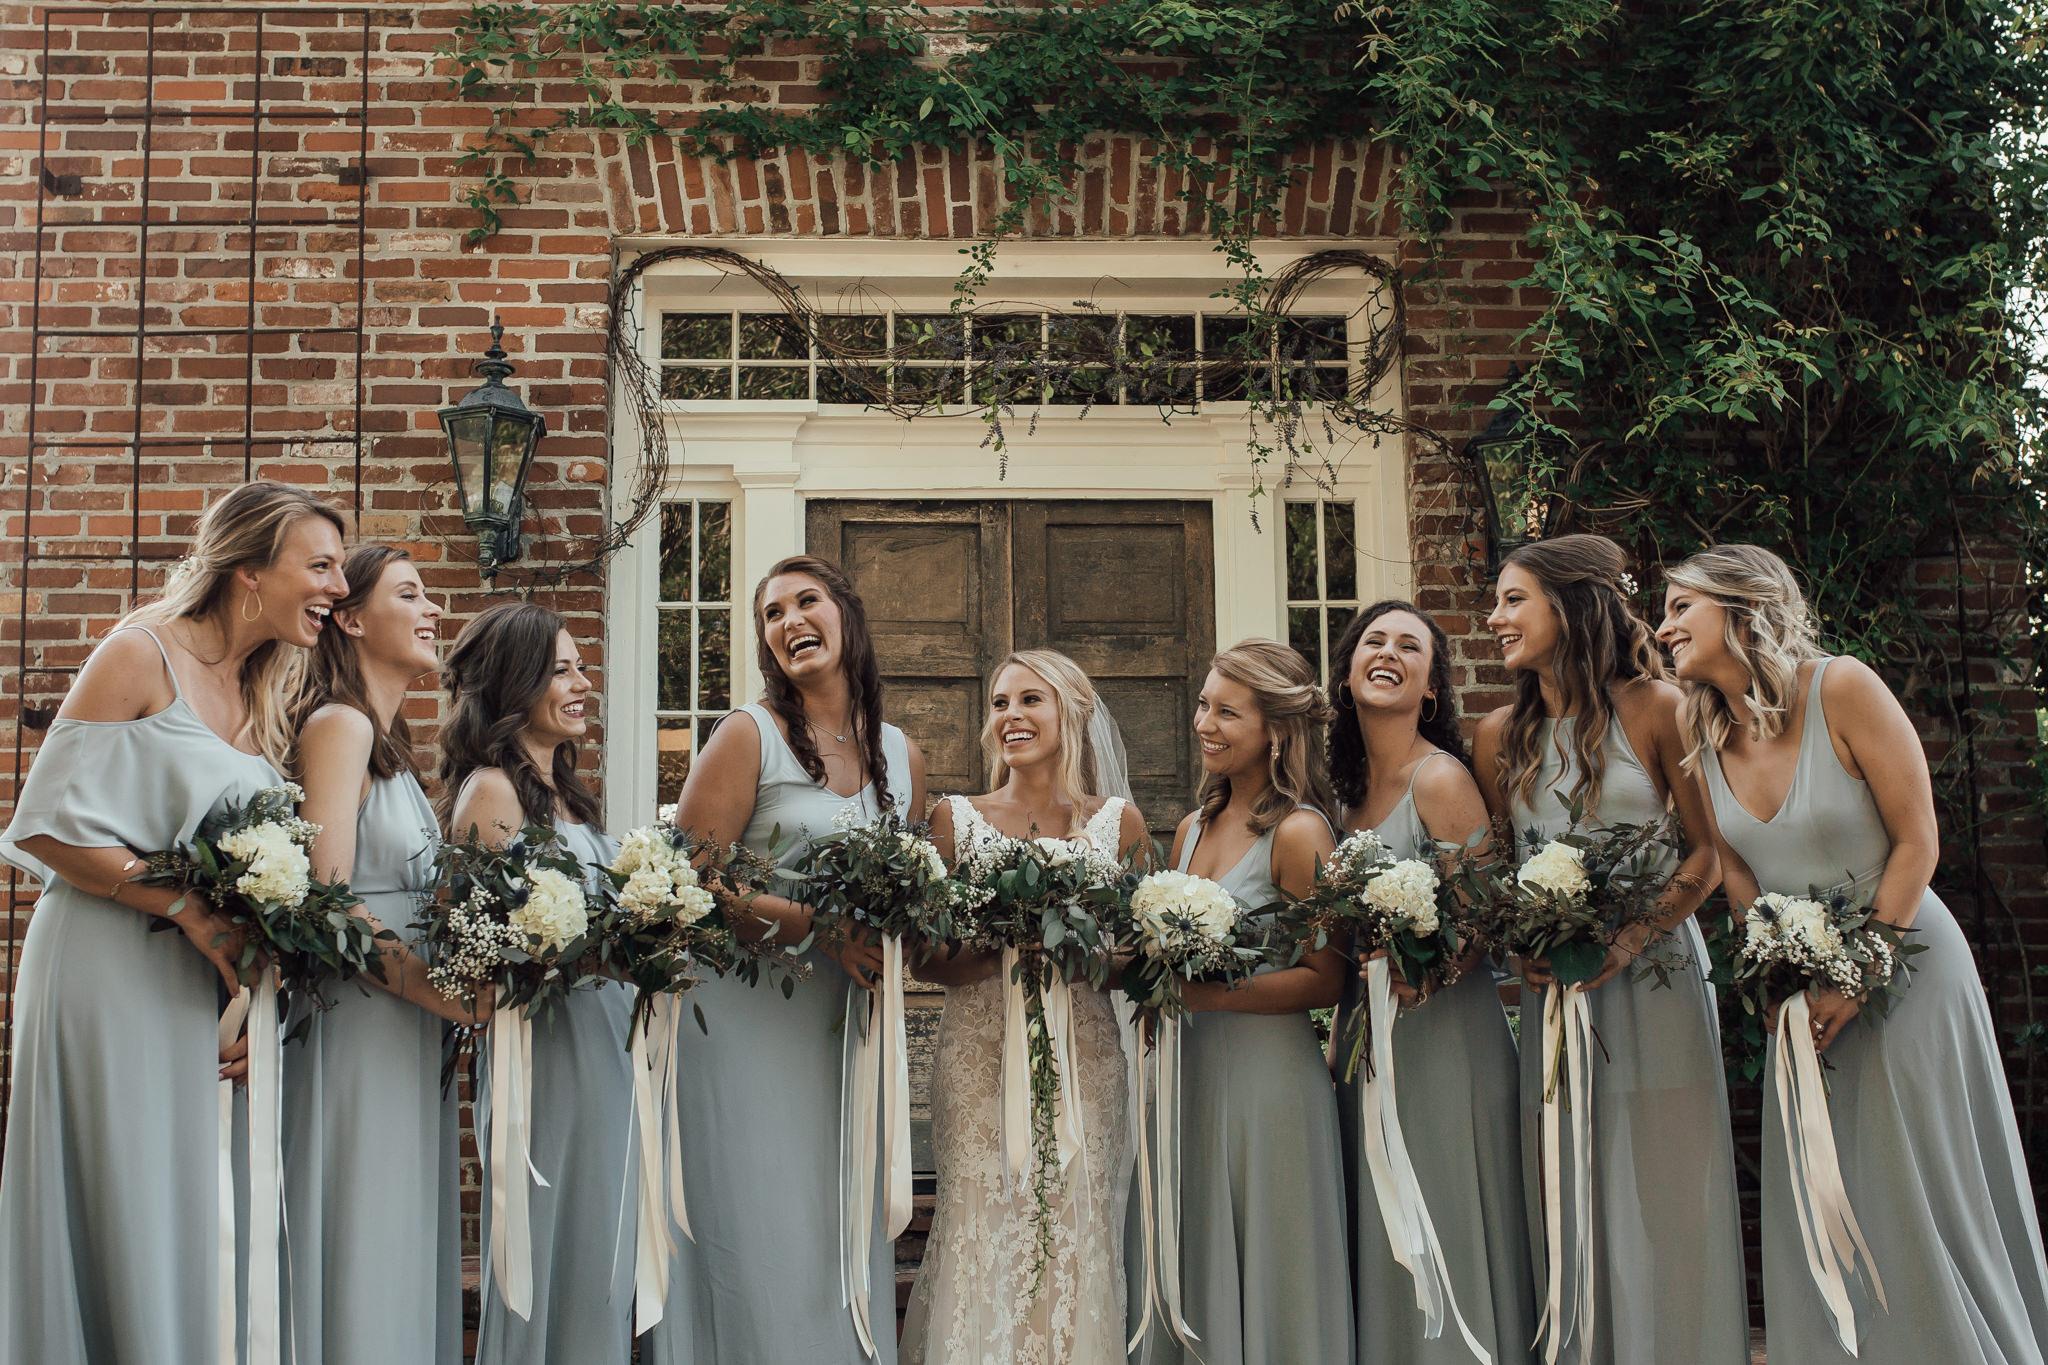 cassie-cook-photography-memphis-wedding-photographer-hedge-farm-wedding-venue-119.jpg